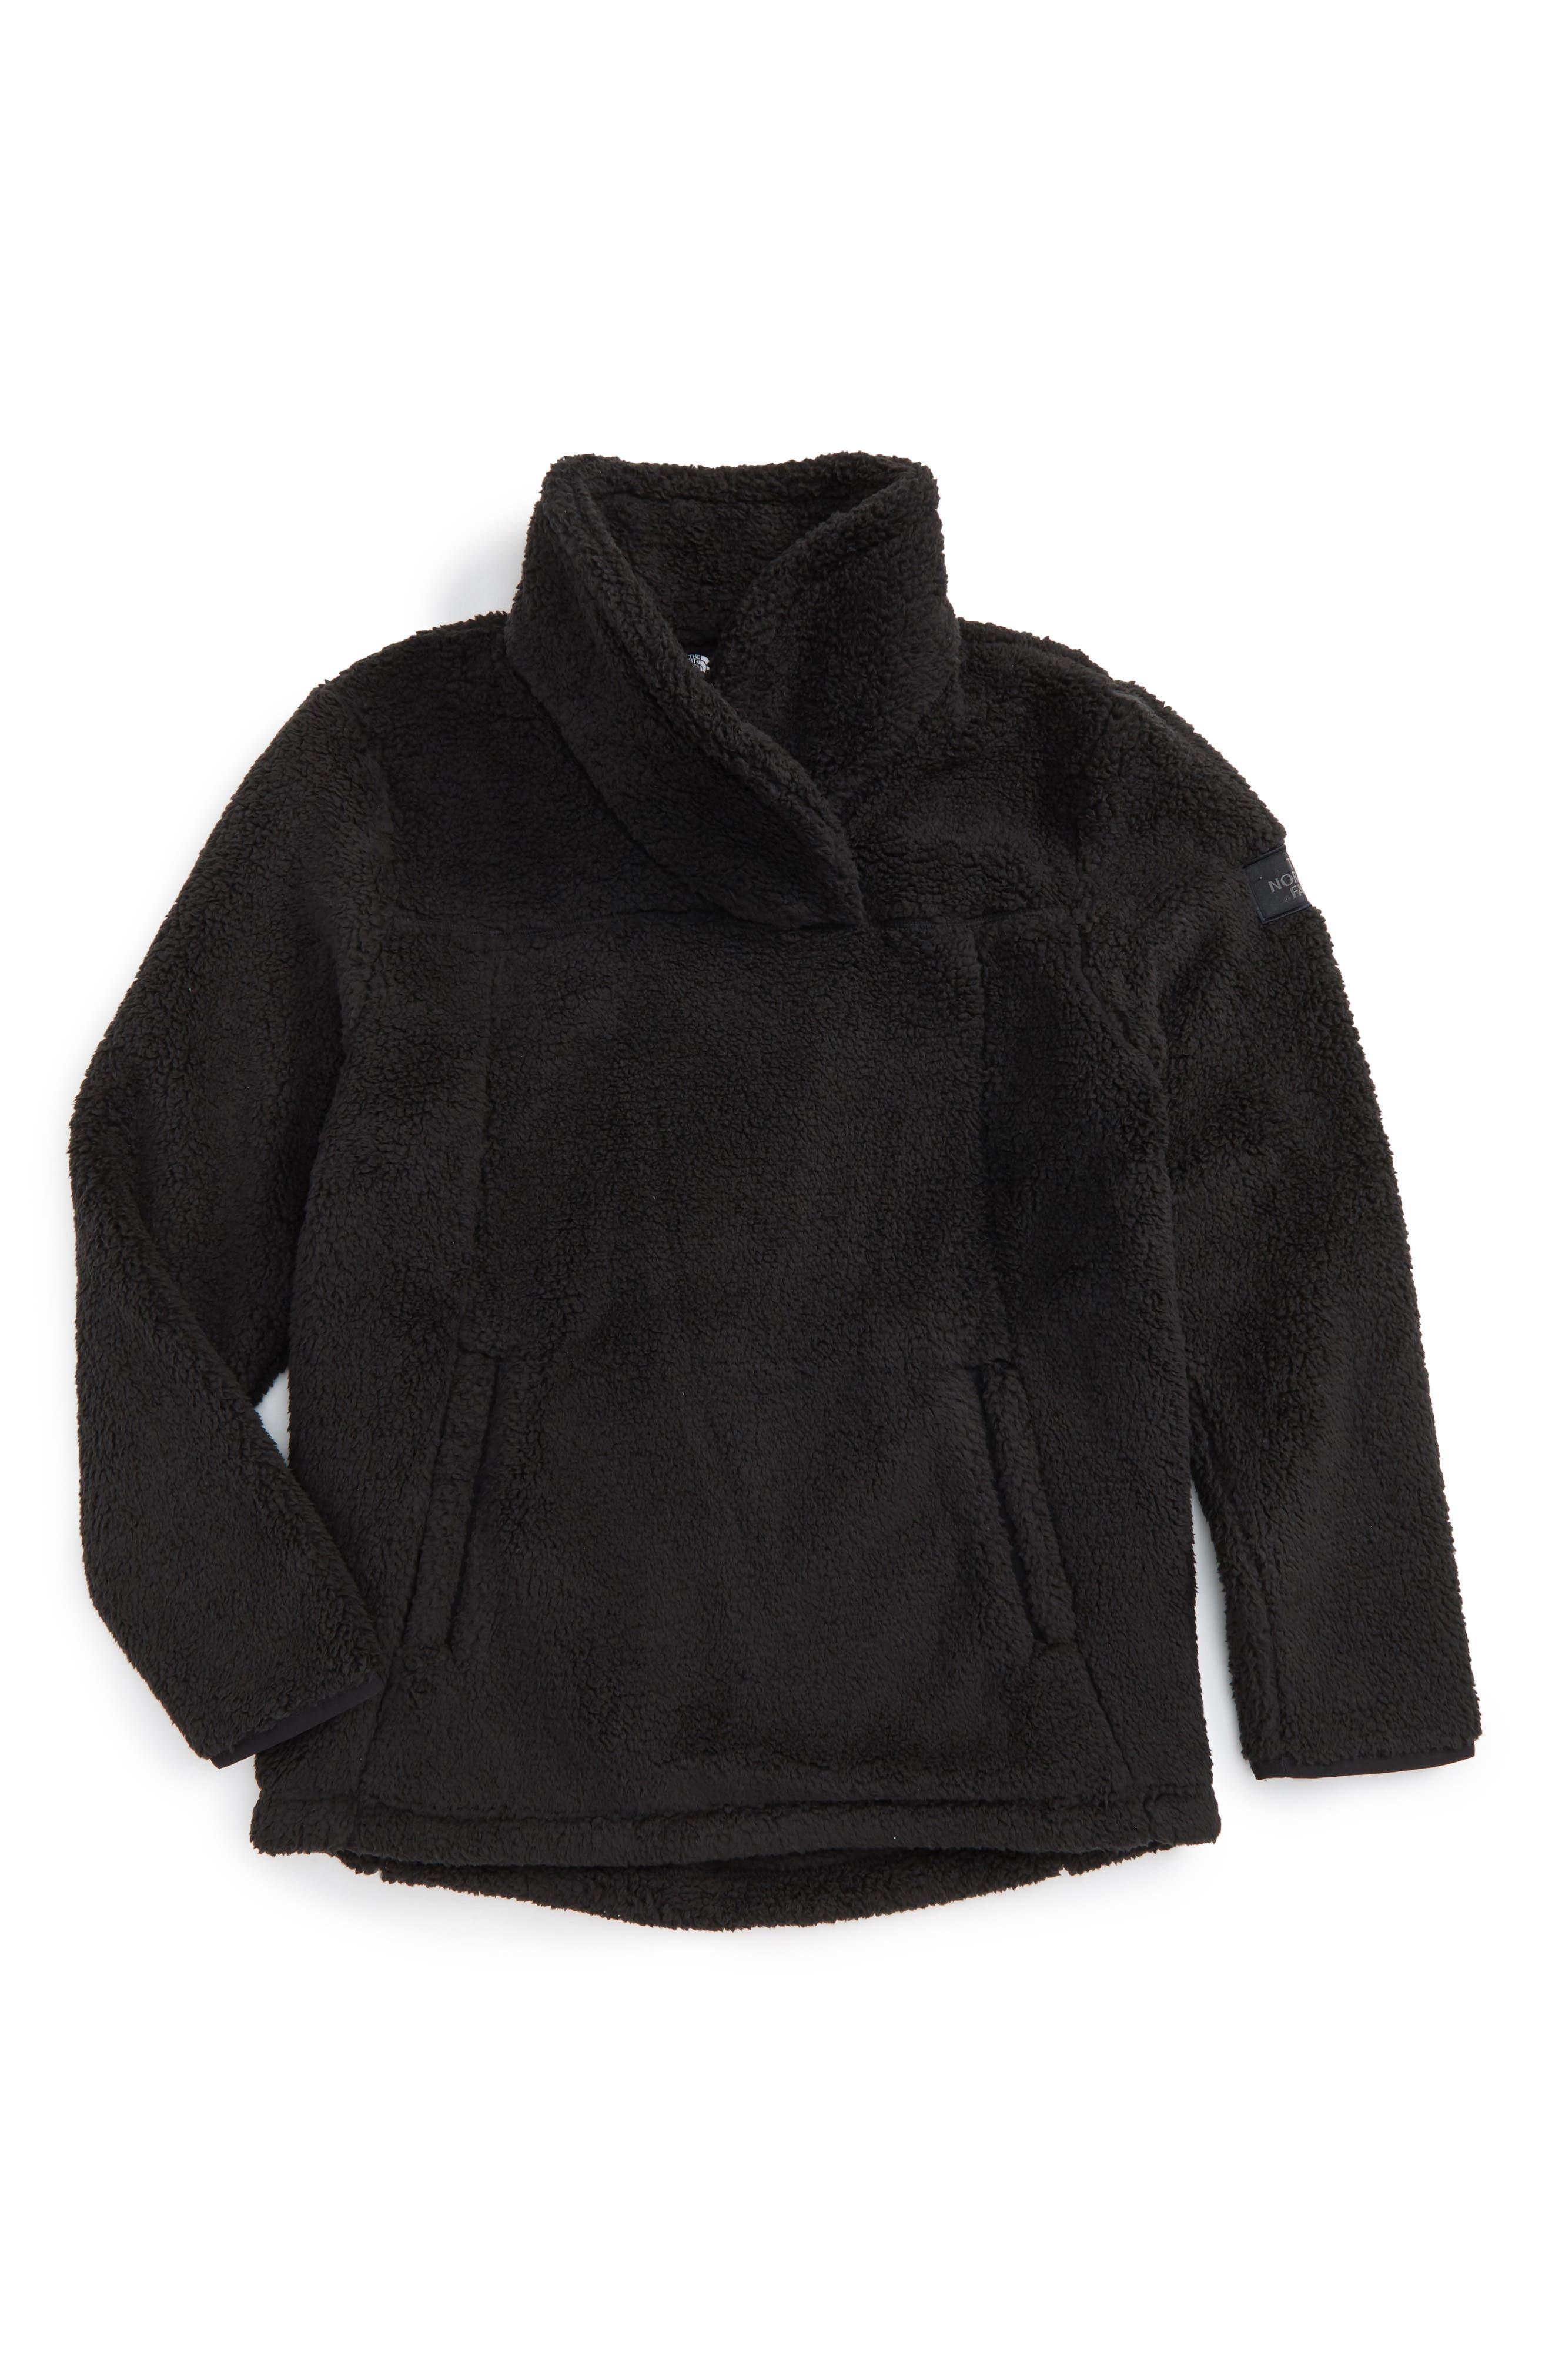 Khampfire Fleece Pullover,                             Main thumbnail 1, color,                             001